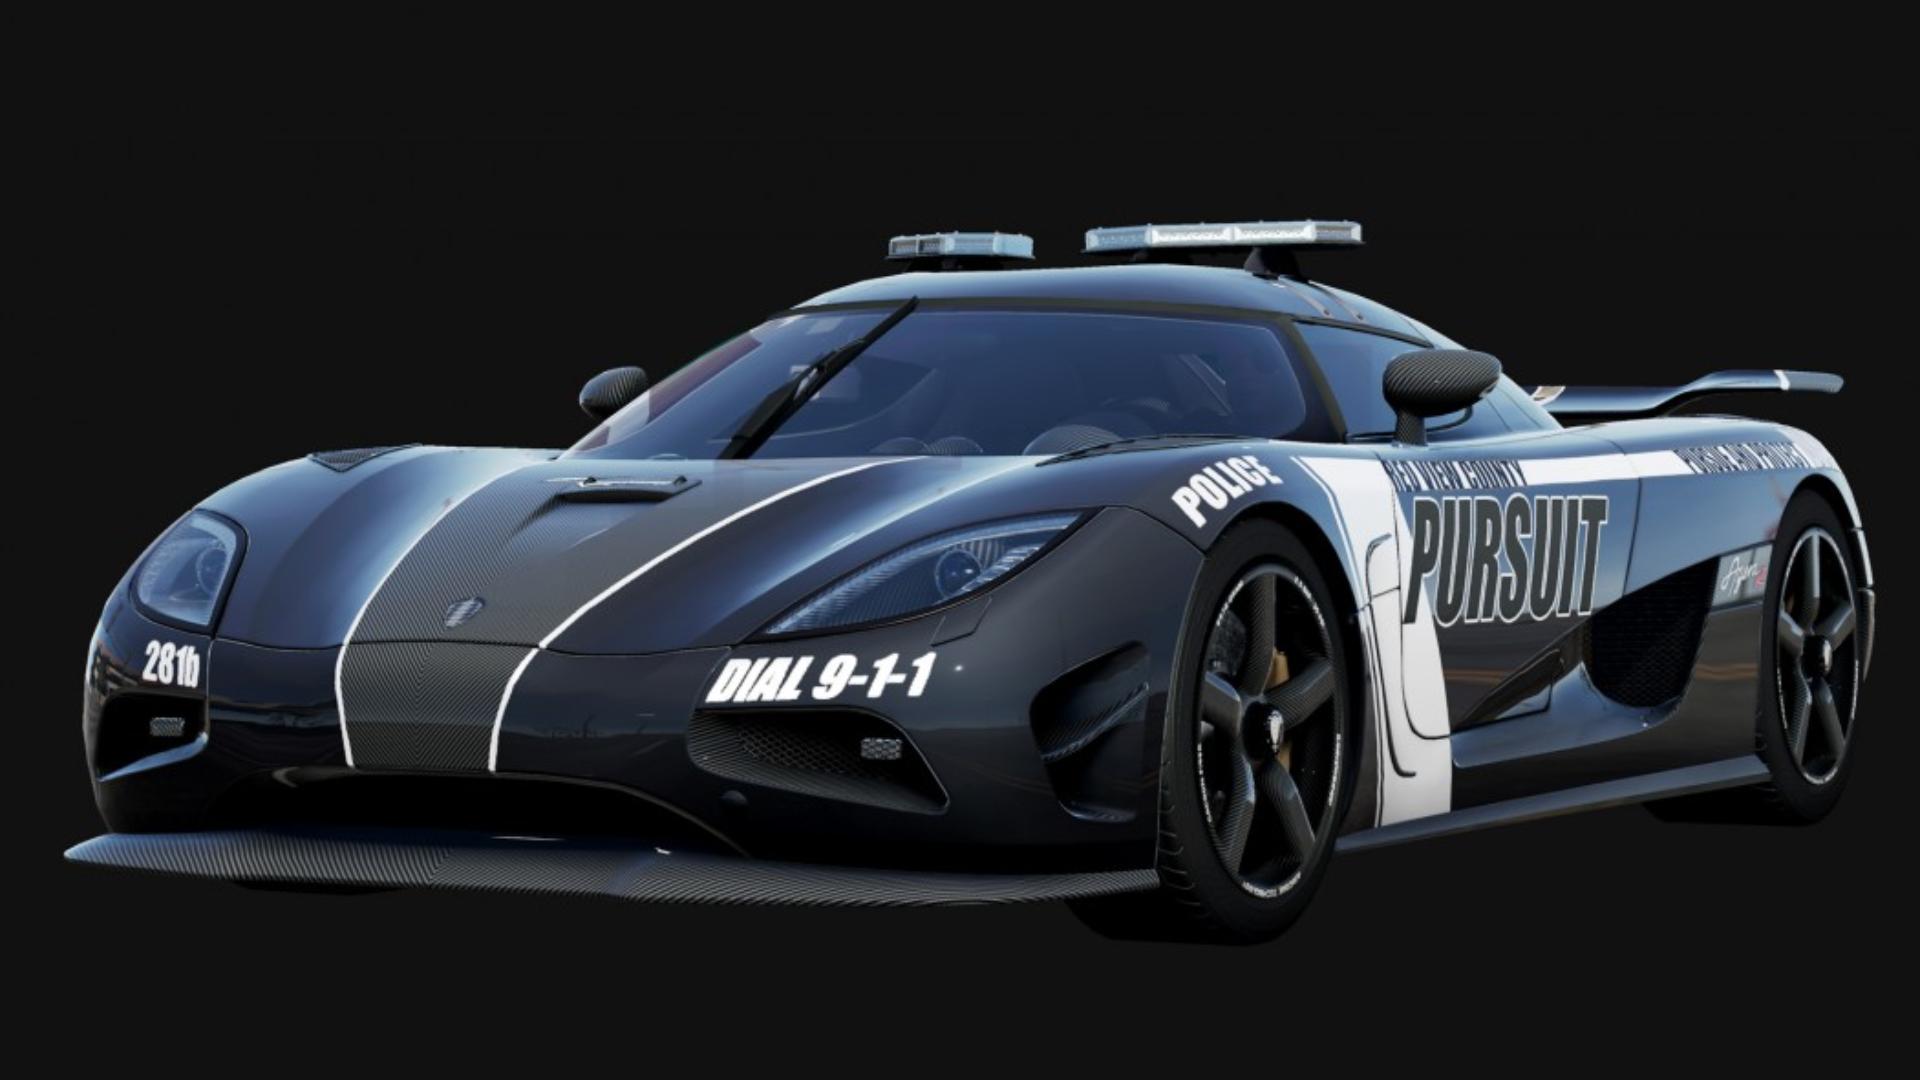 Koenigsegg Agera R Police Car By AcerSense